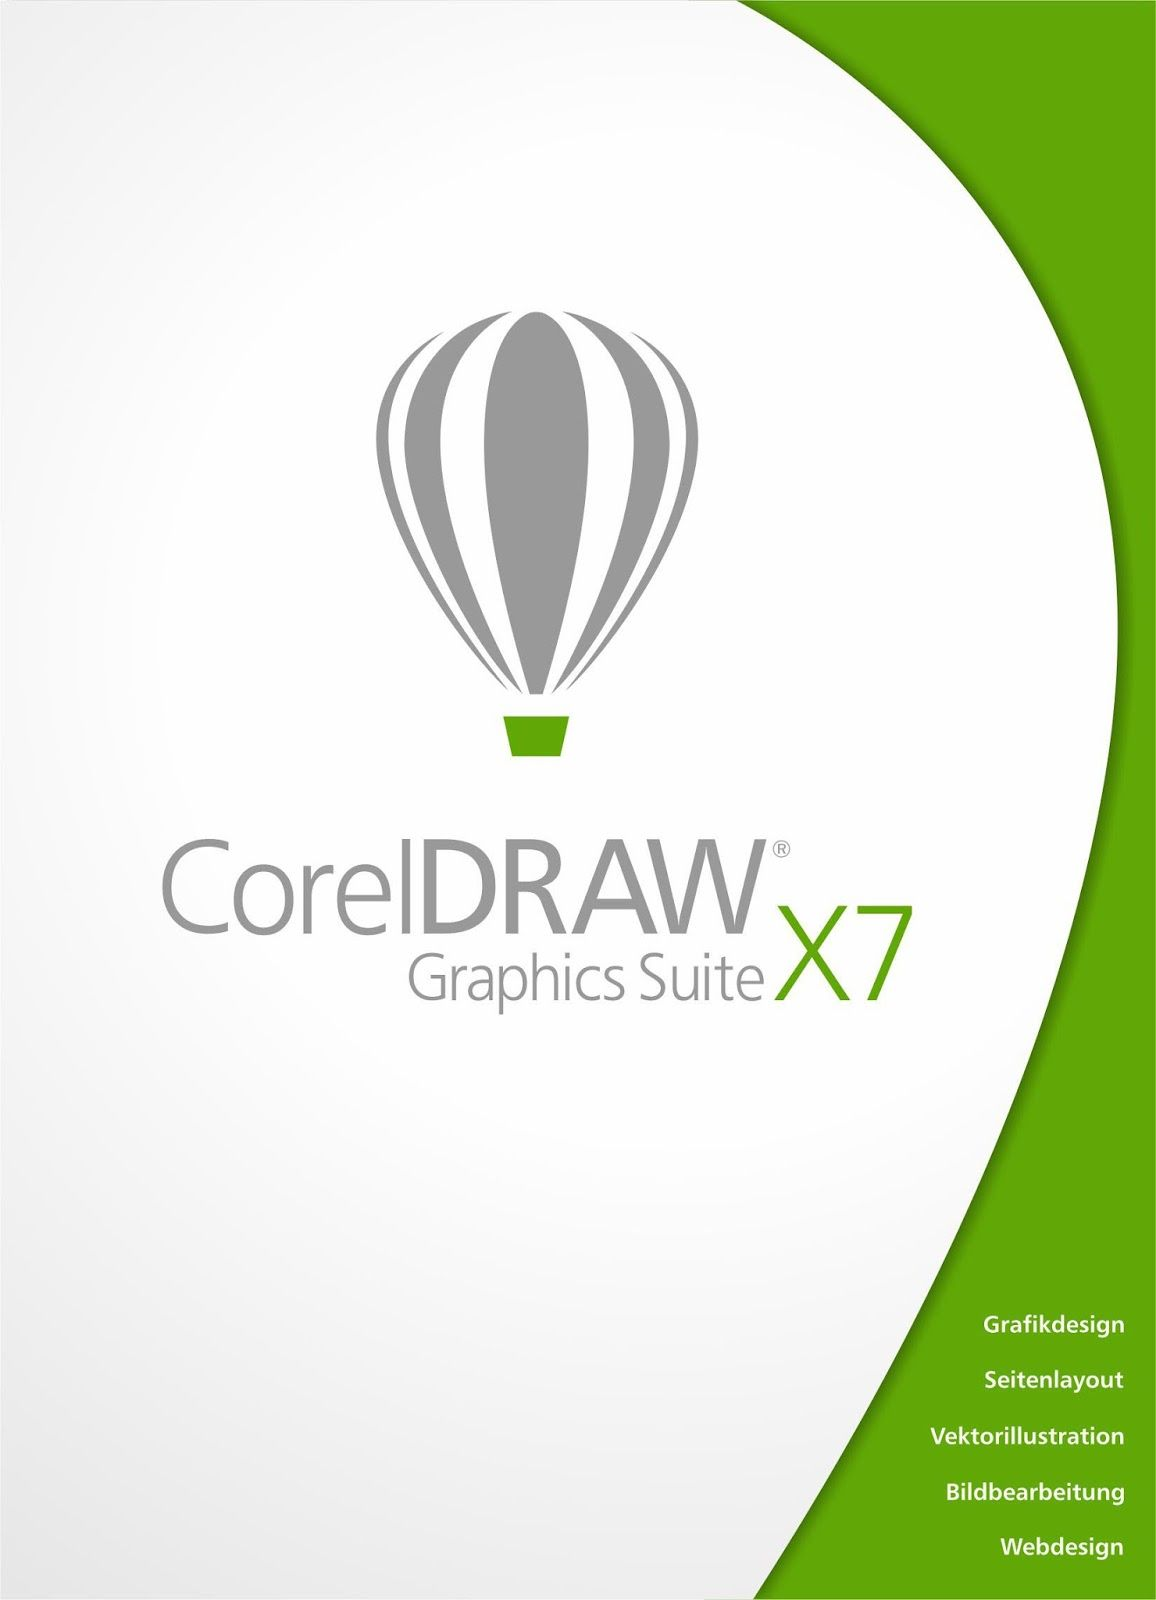 baixar corel draw para celular android gratis